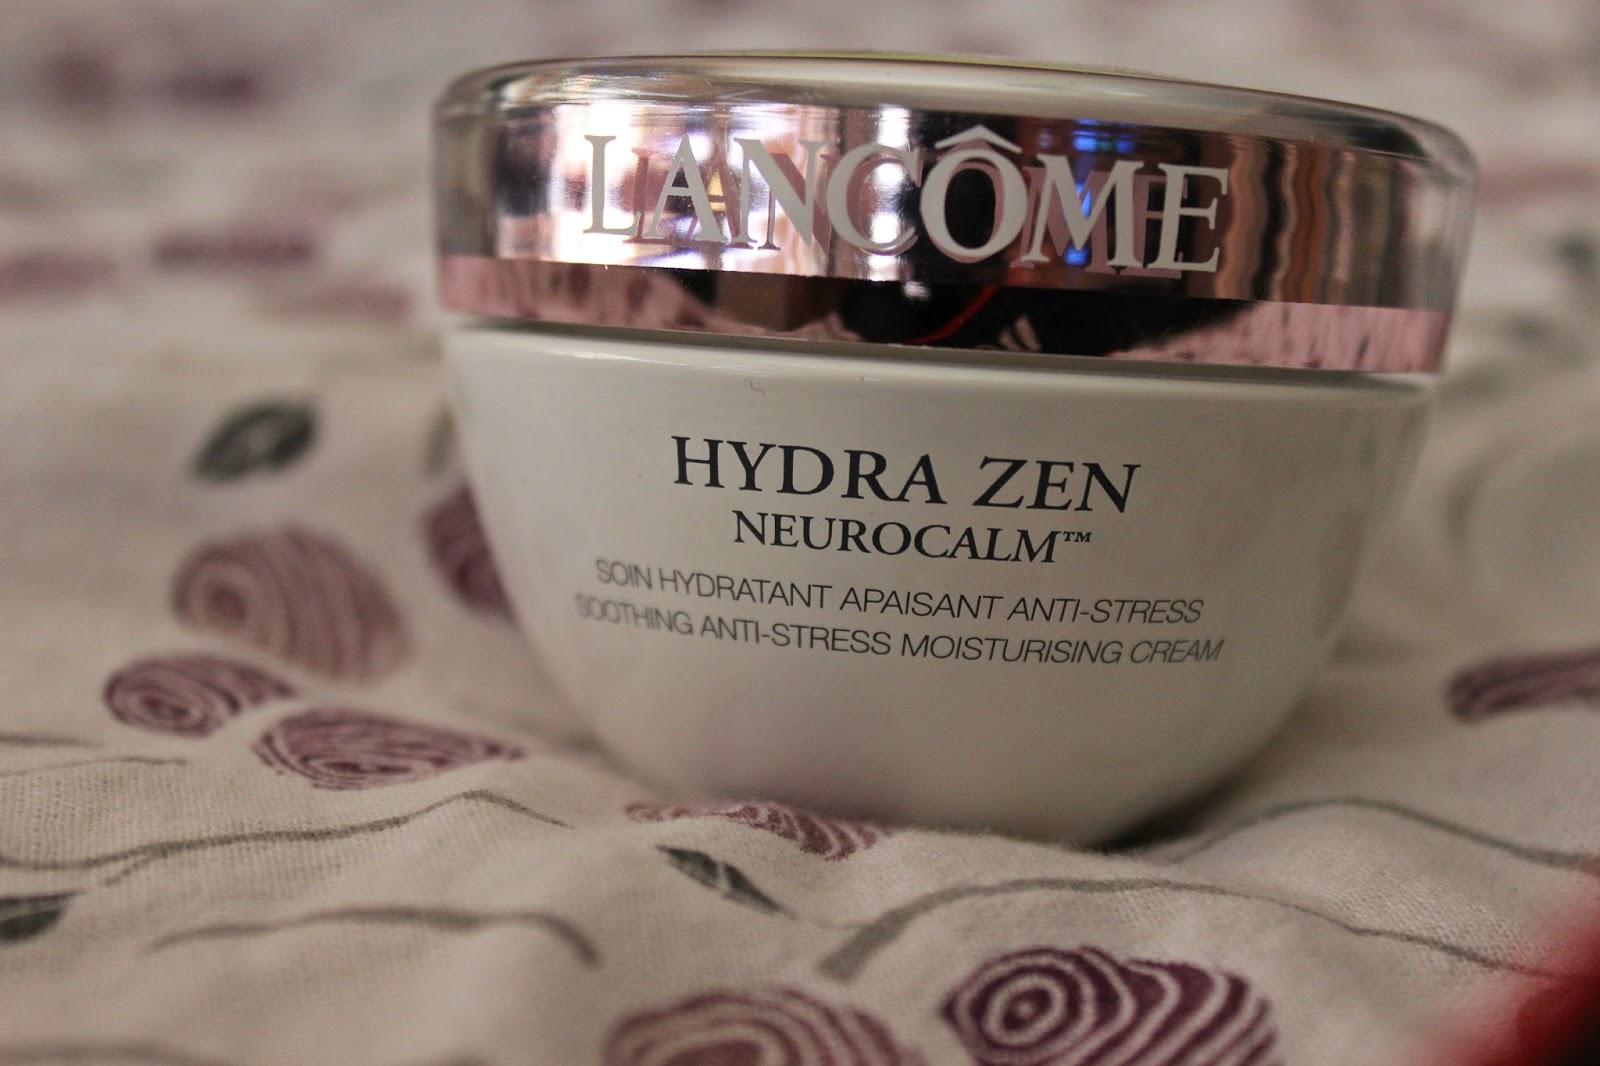 Lancome hydra zen neurocalm